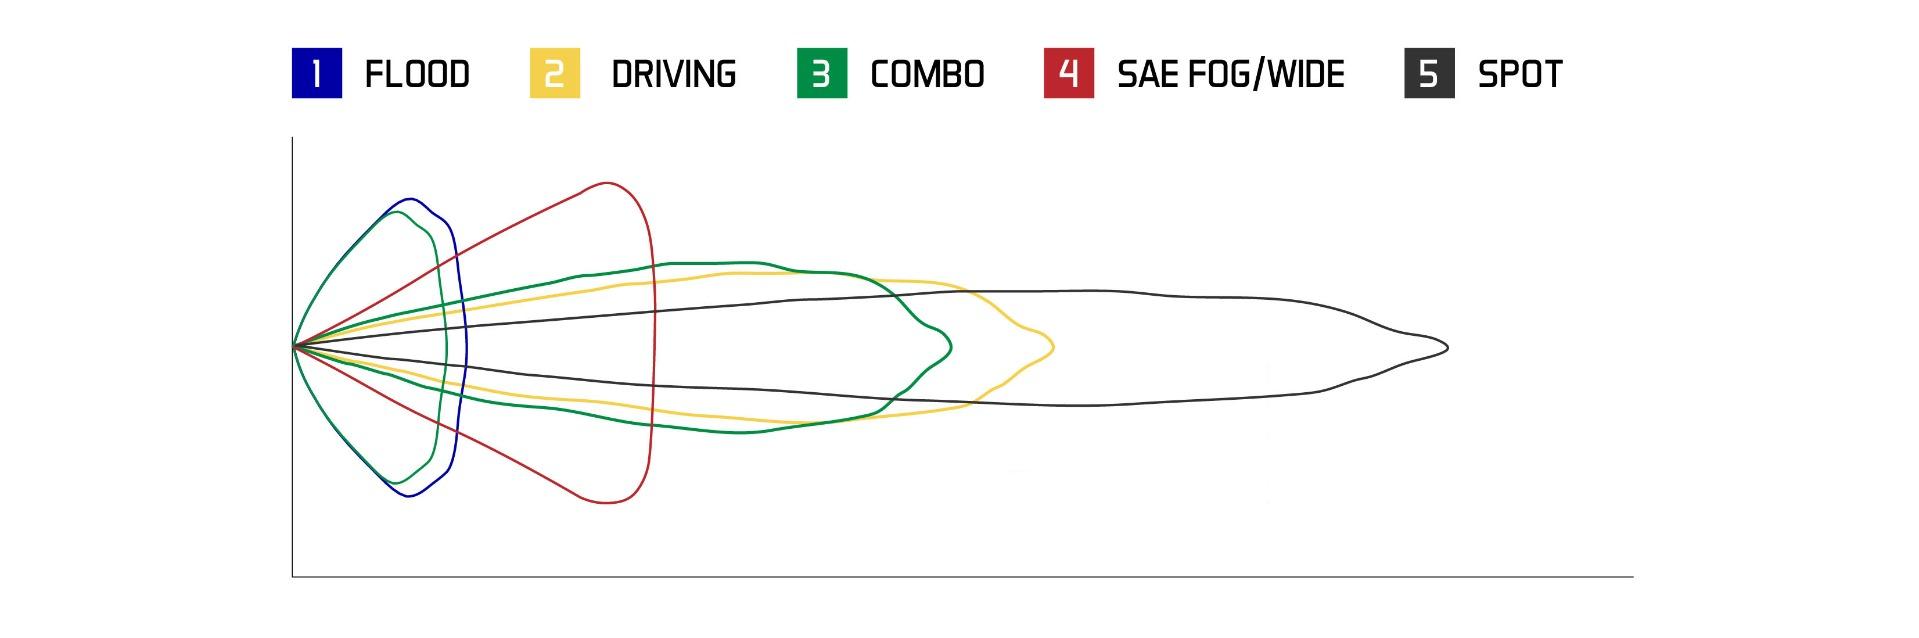 Stage Series C2 Beam Patterns